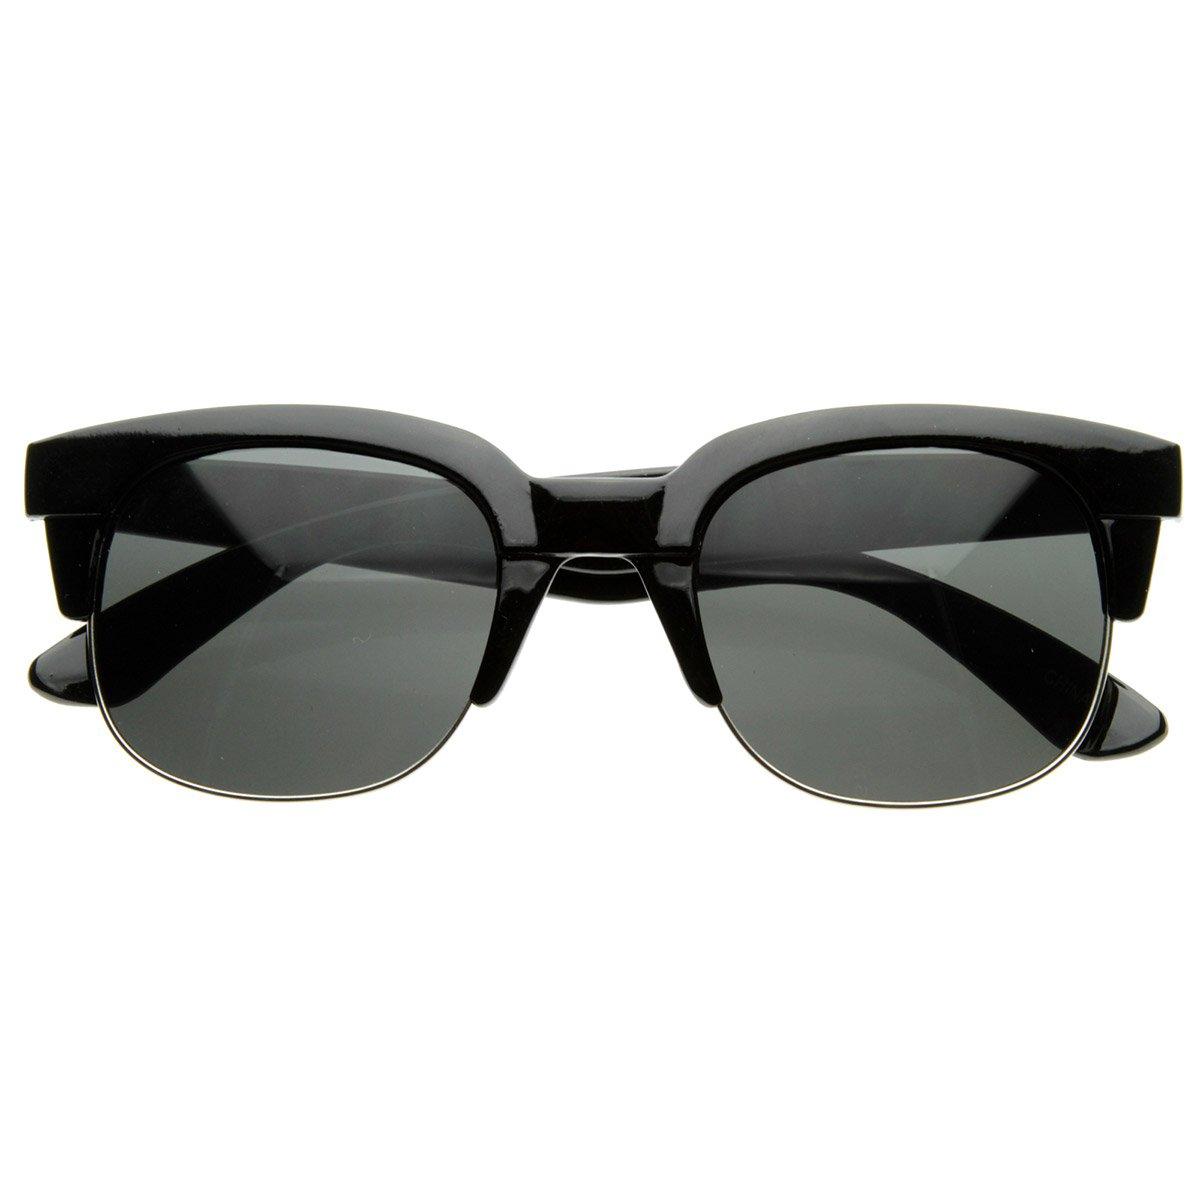 Super Square Modern Fashion Half Frame Retro Horn Rimmed Sunglasses Shiny Black